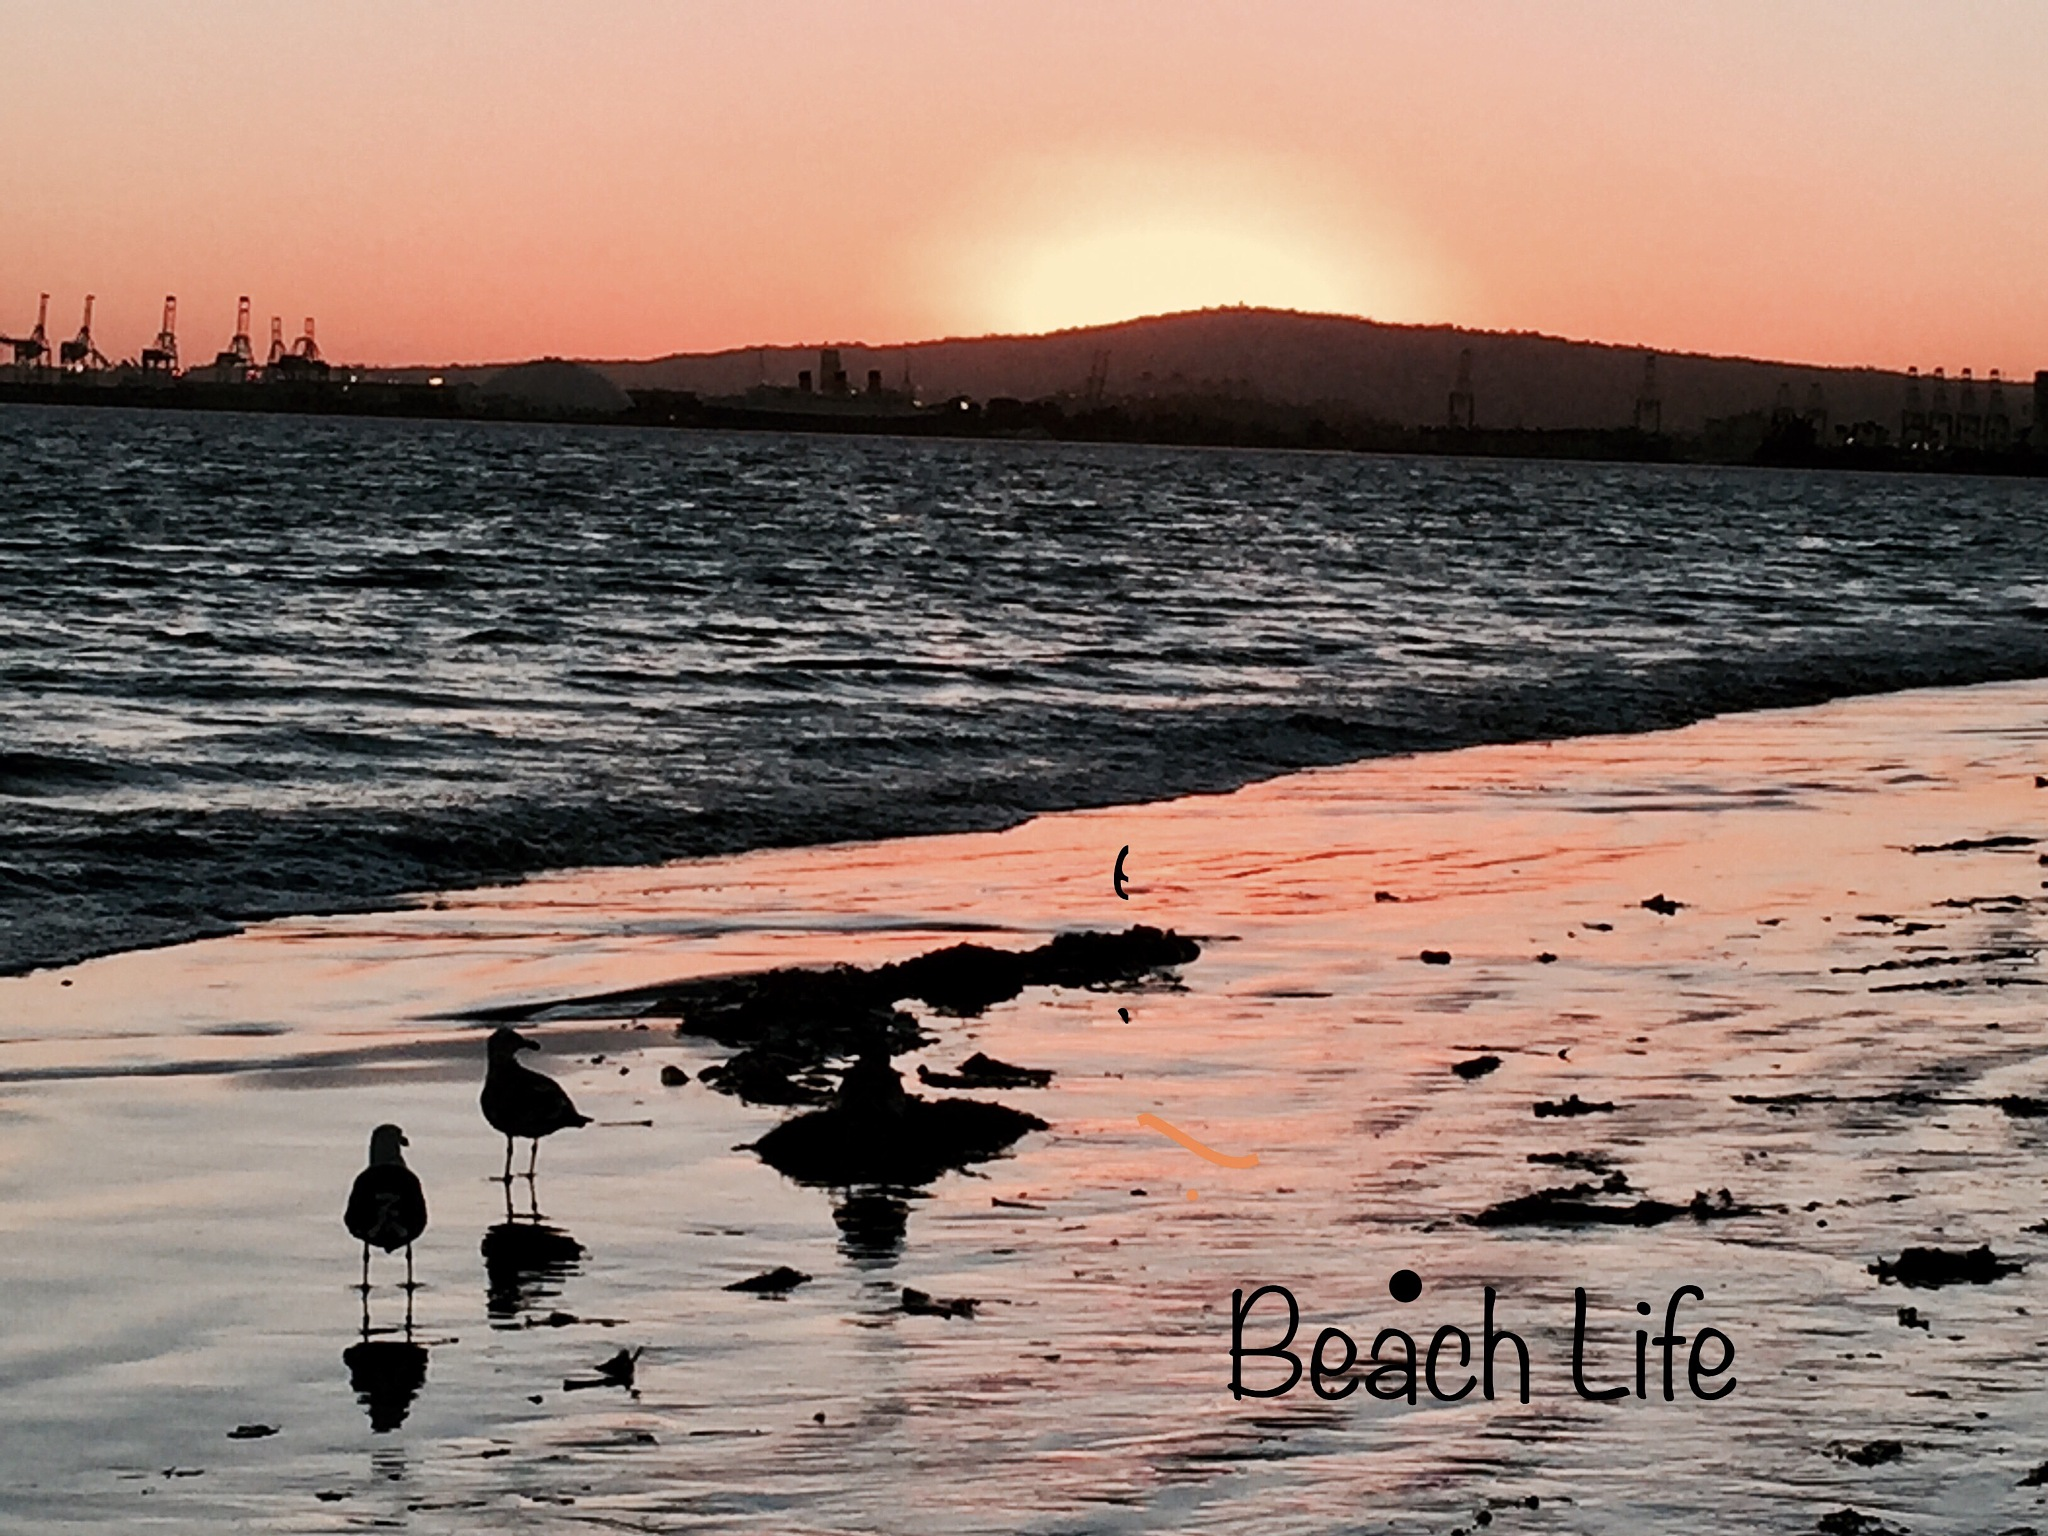 Beach Life by maryann.mishko